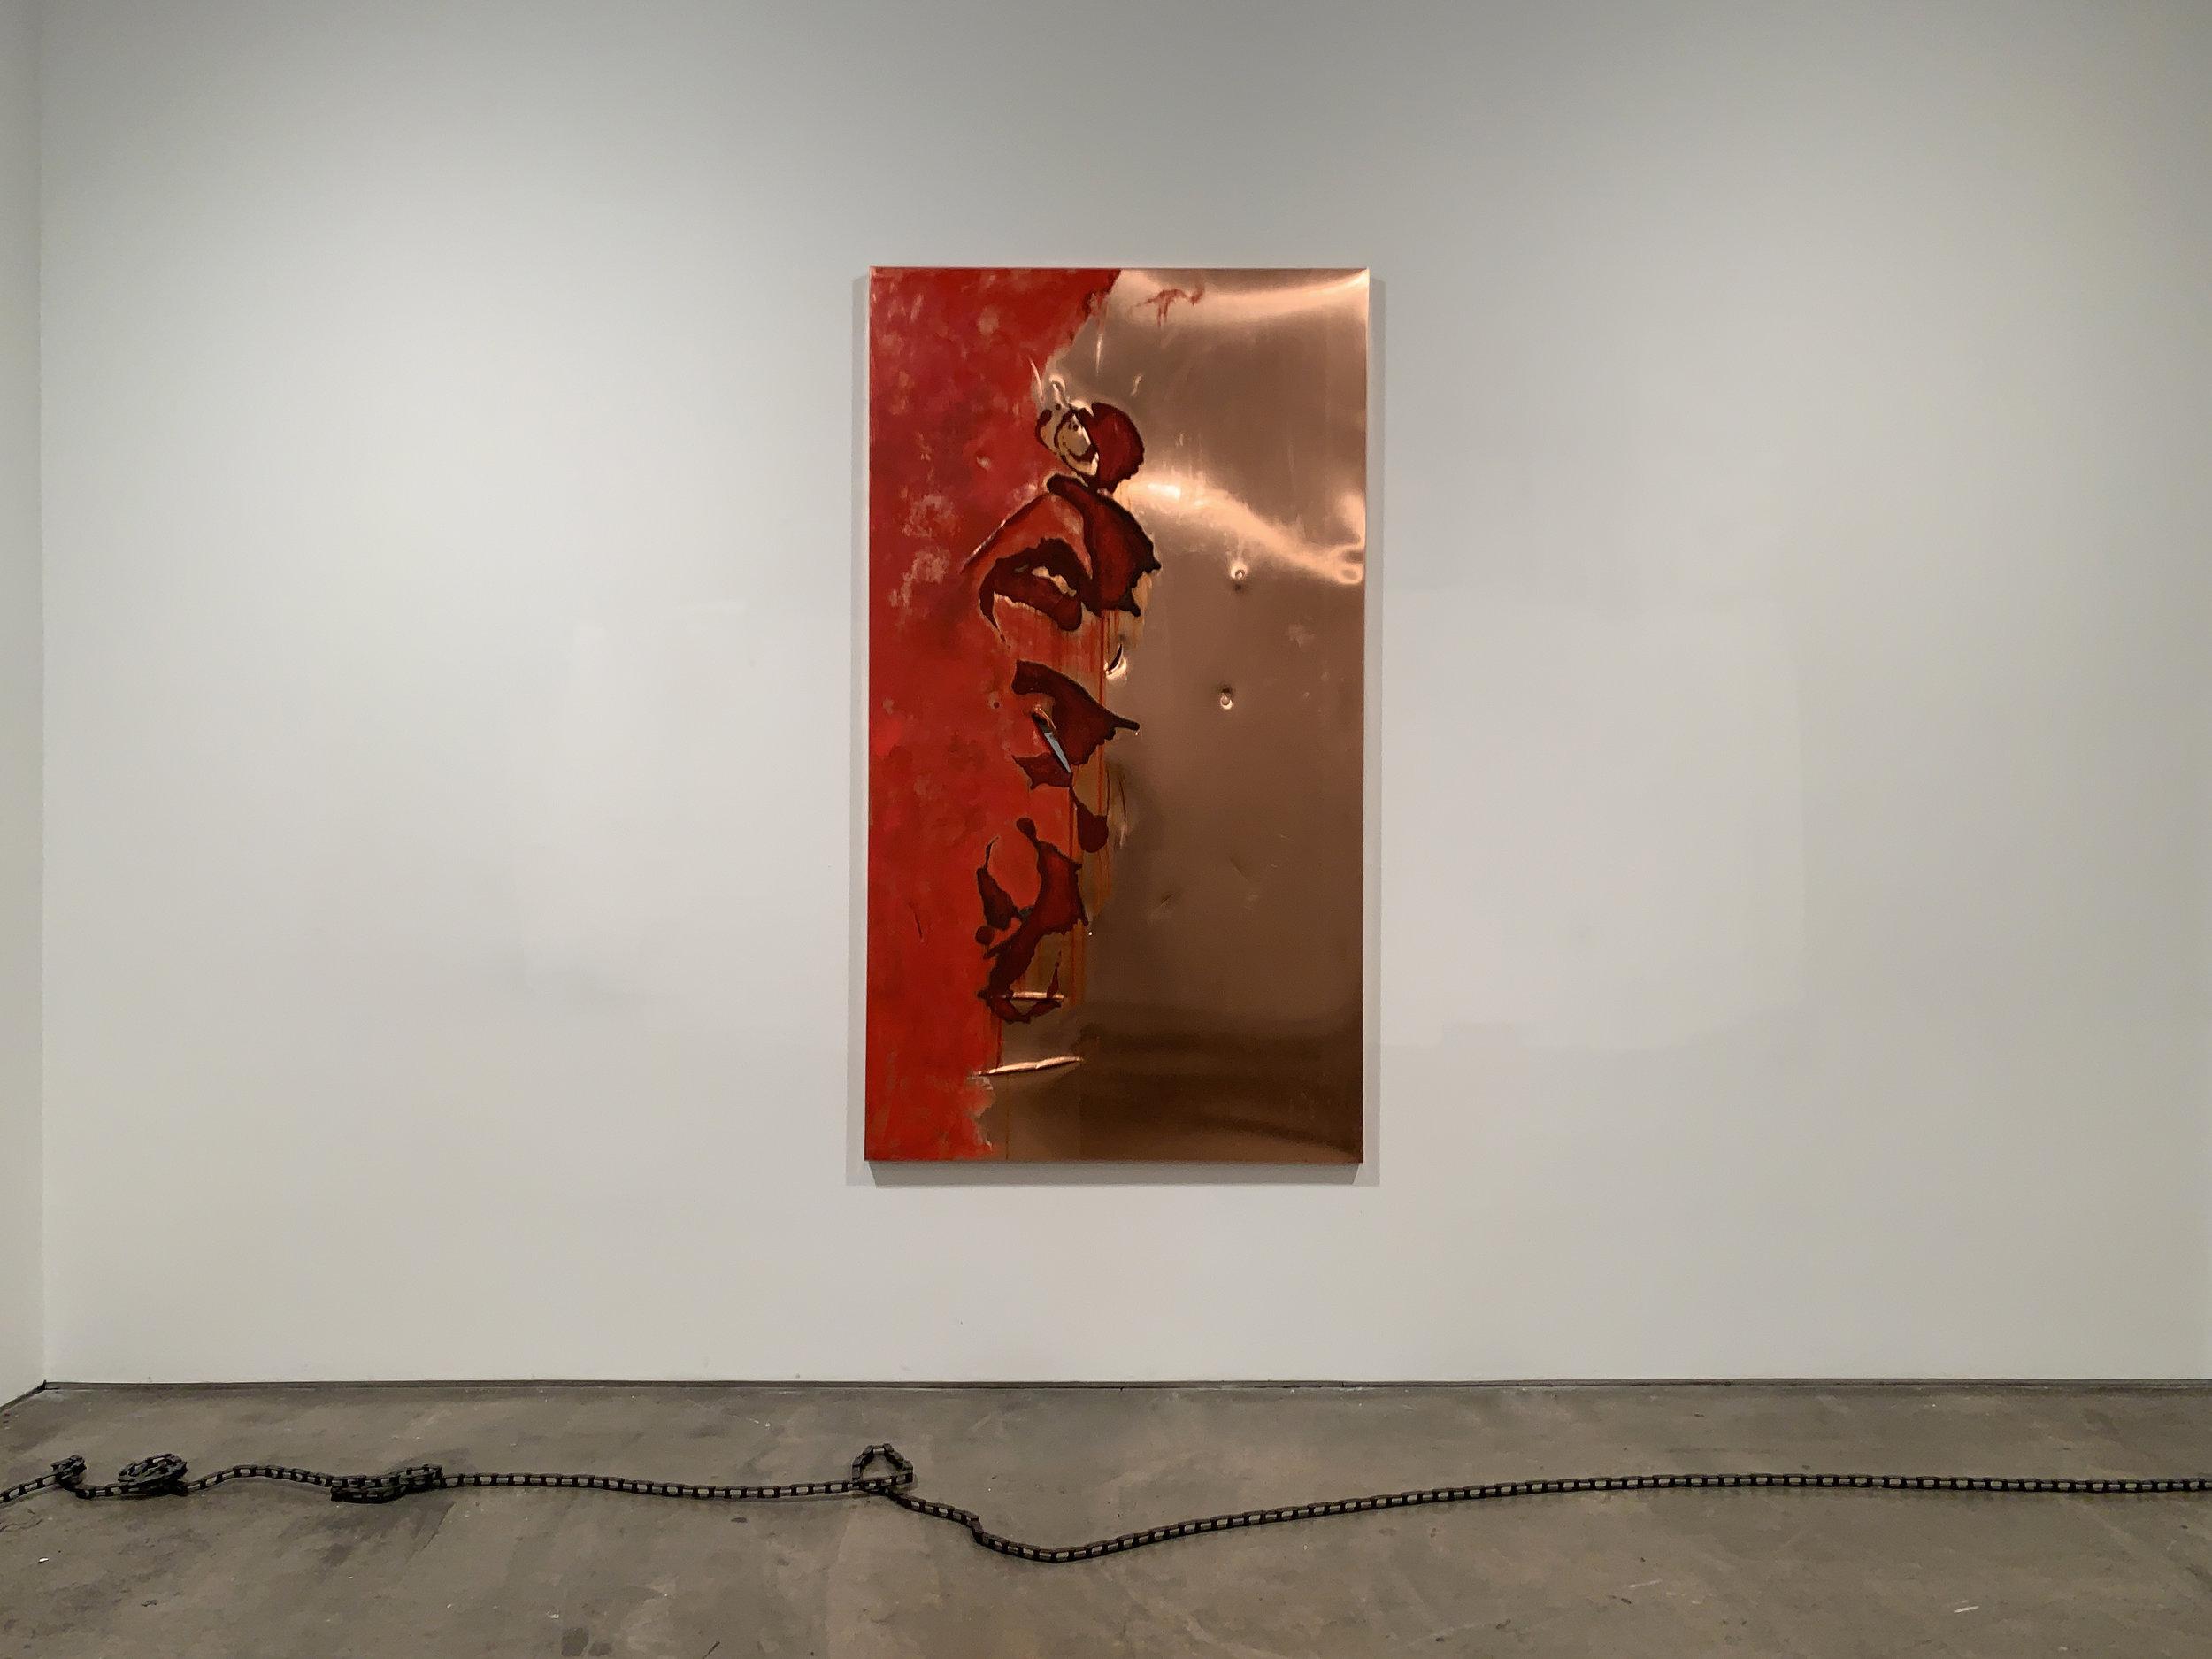 Franz-Klainsek_CHAINS_Copper Wall Sculptures_2019_RED.jpg